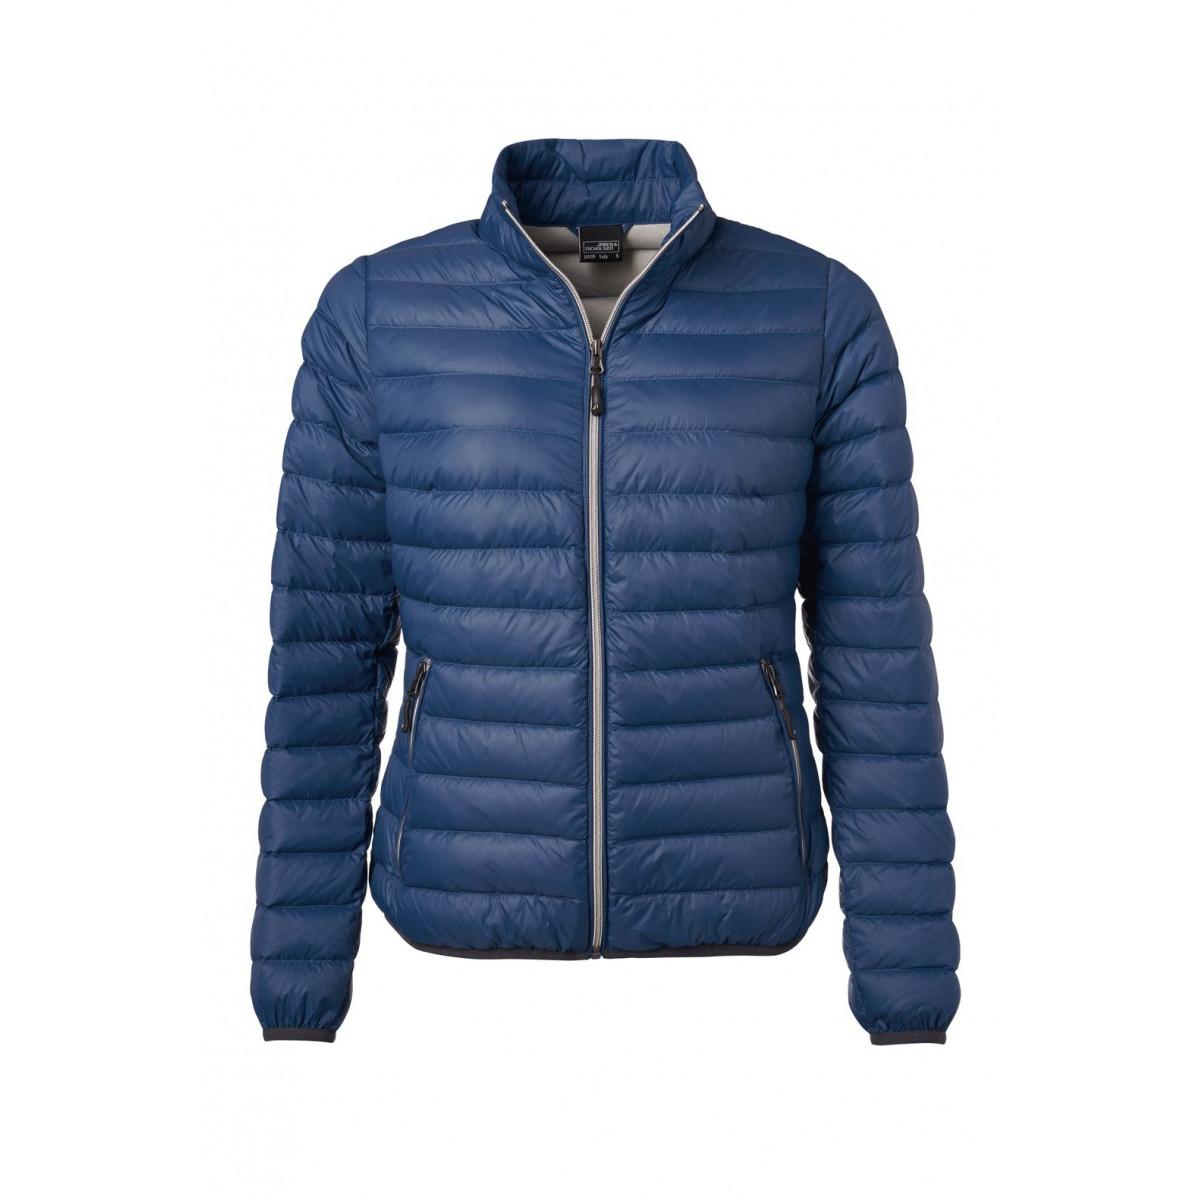 Куртка женская JN1139 Ladies Down Jacket - Темно-синий/Серебряный